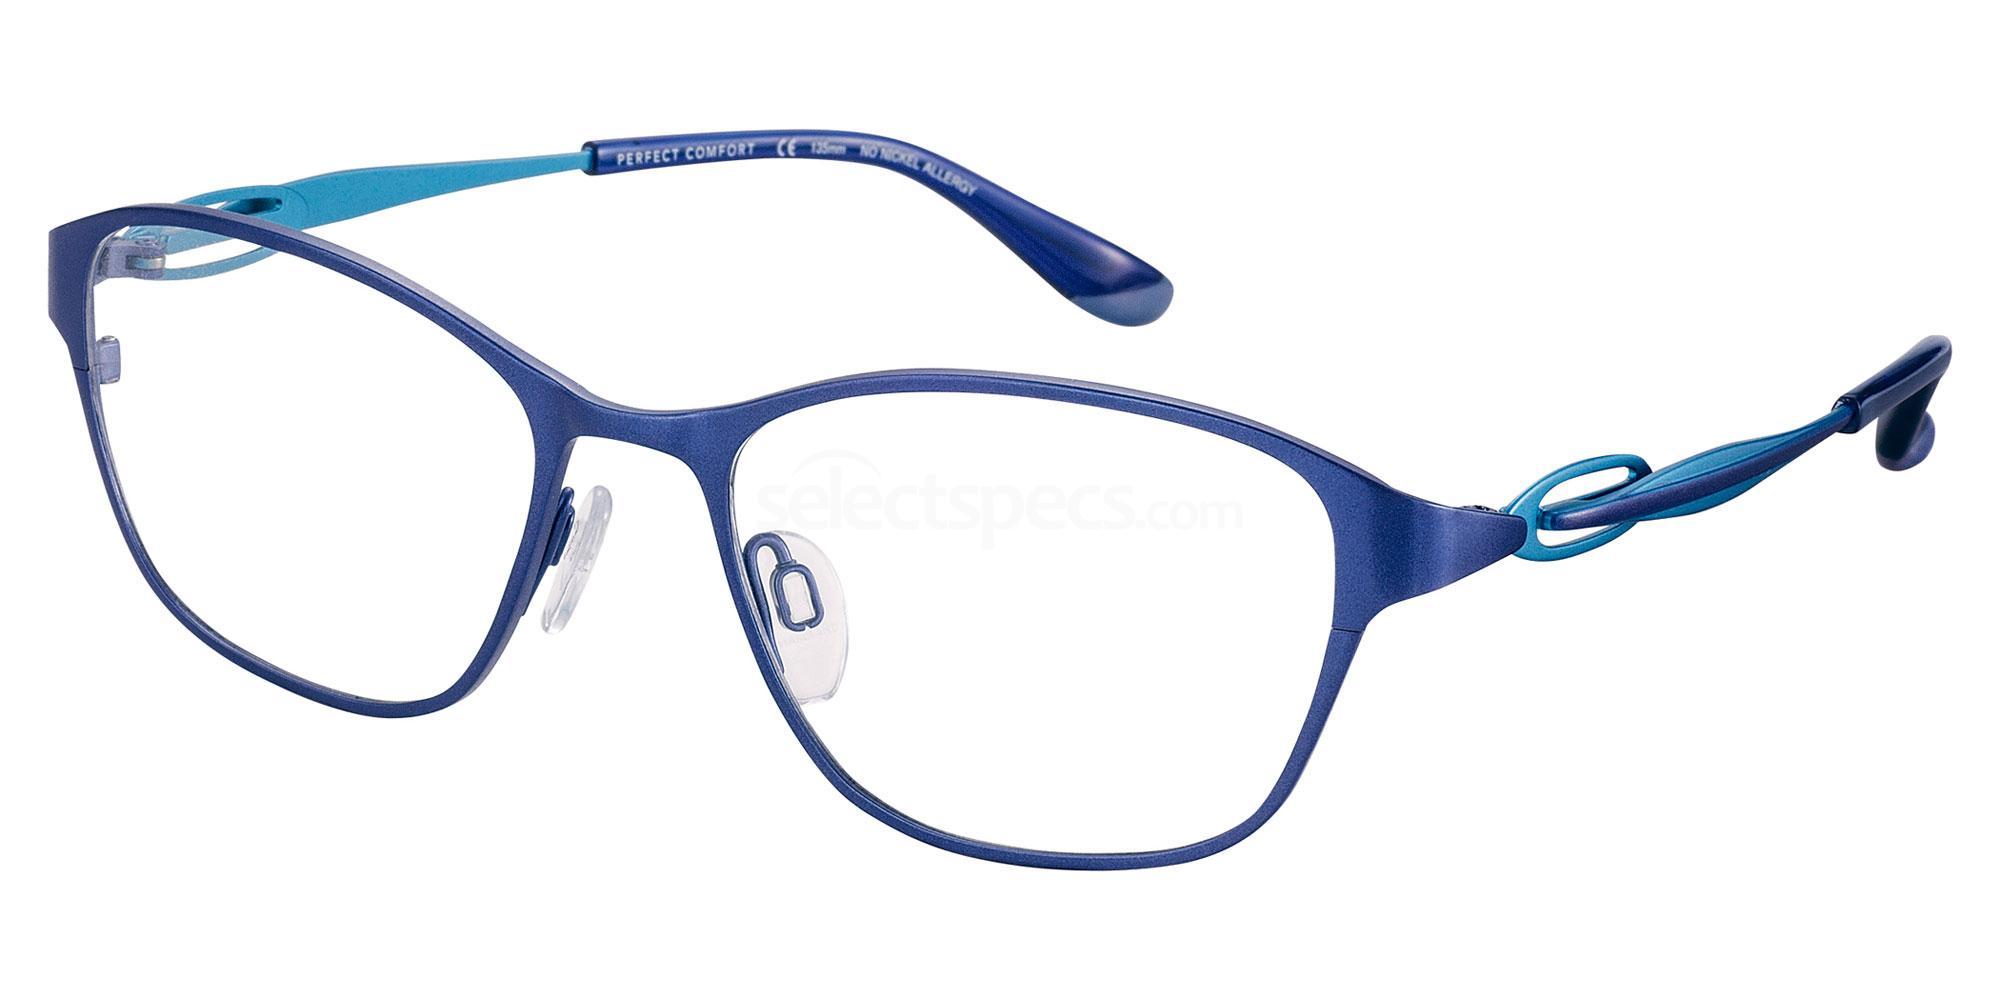 BL CH10609 Glasses, Charmant Perfect Comfort